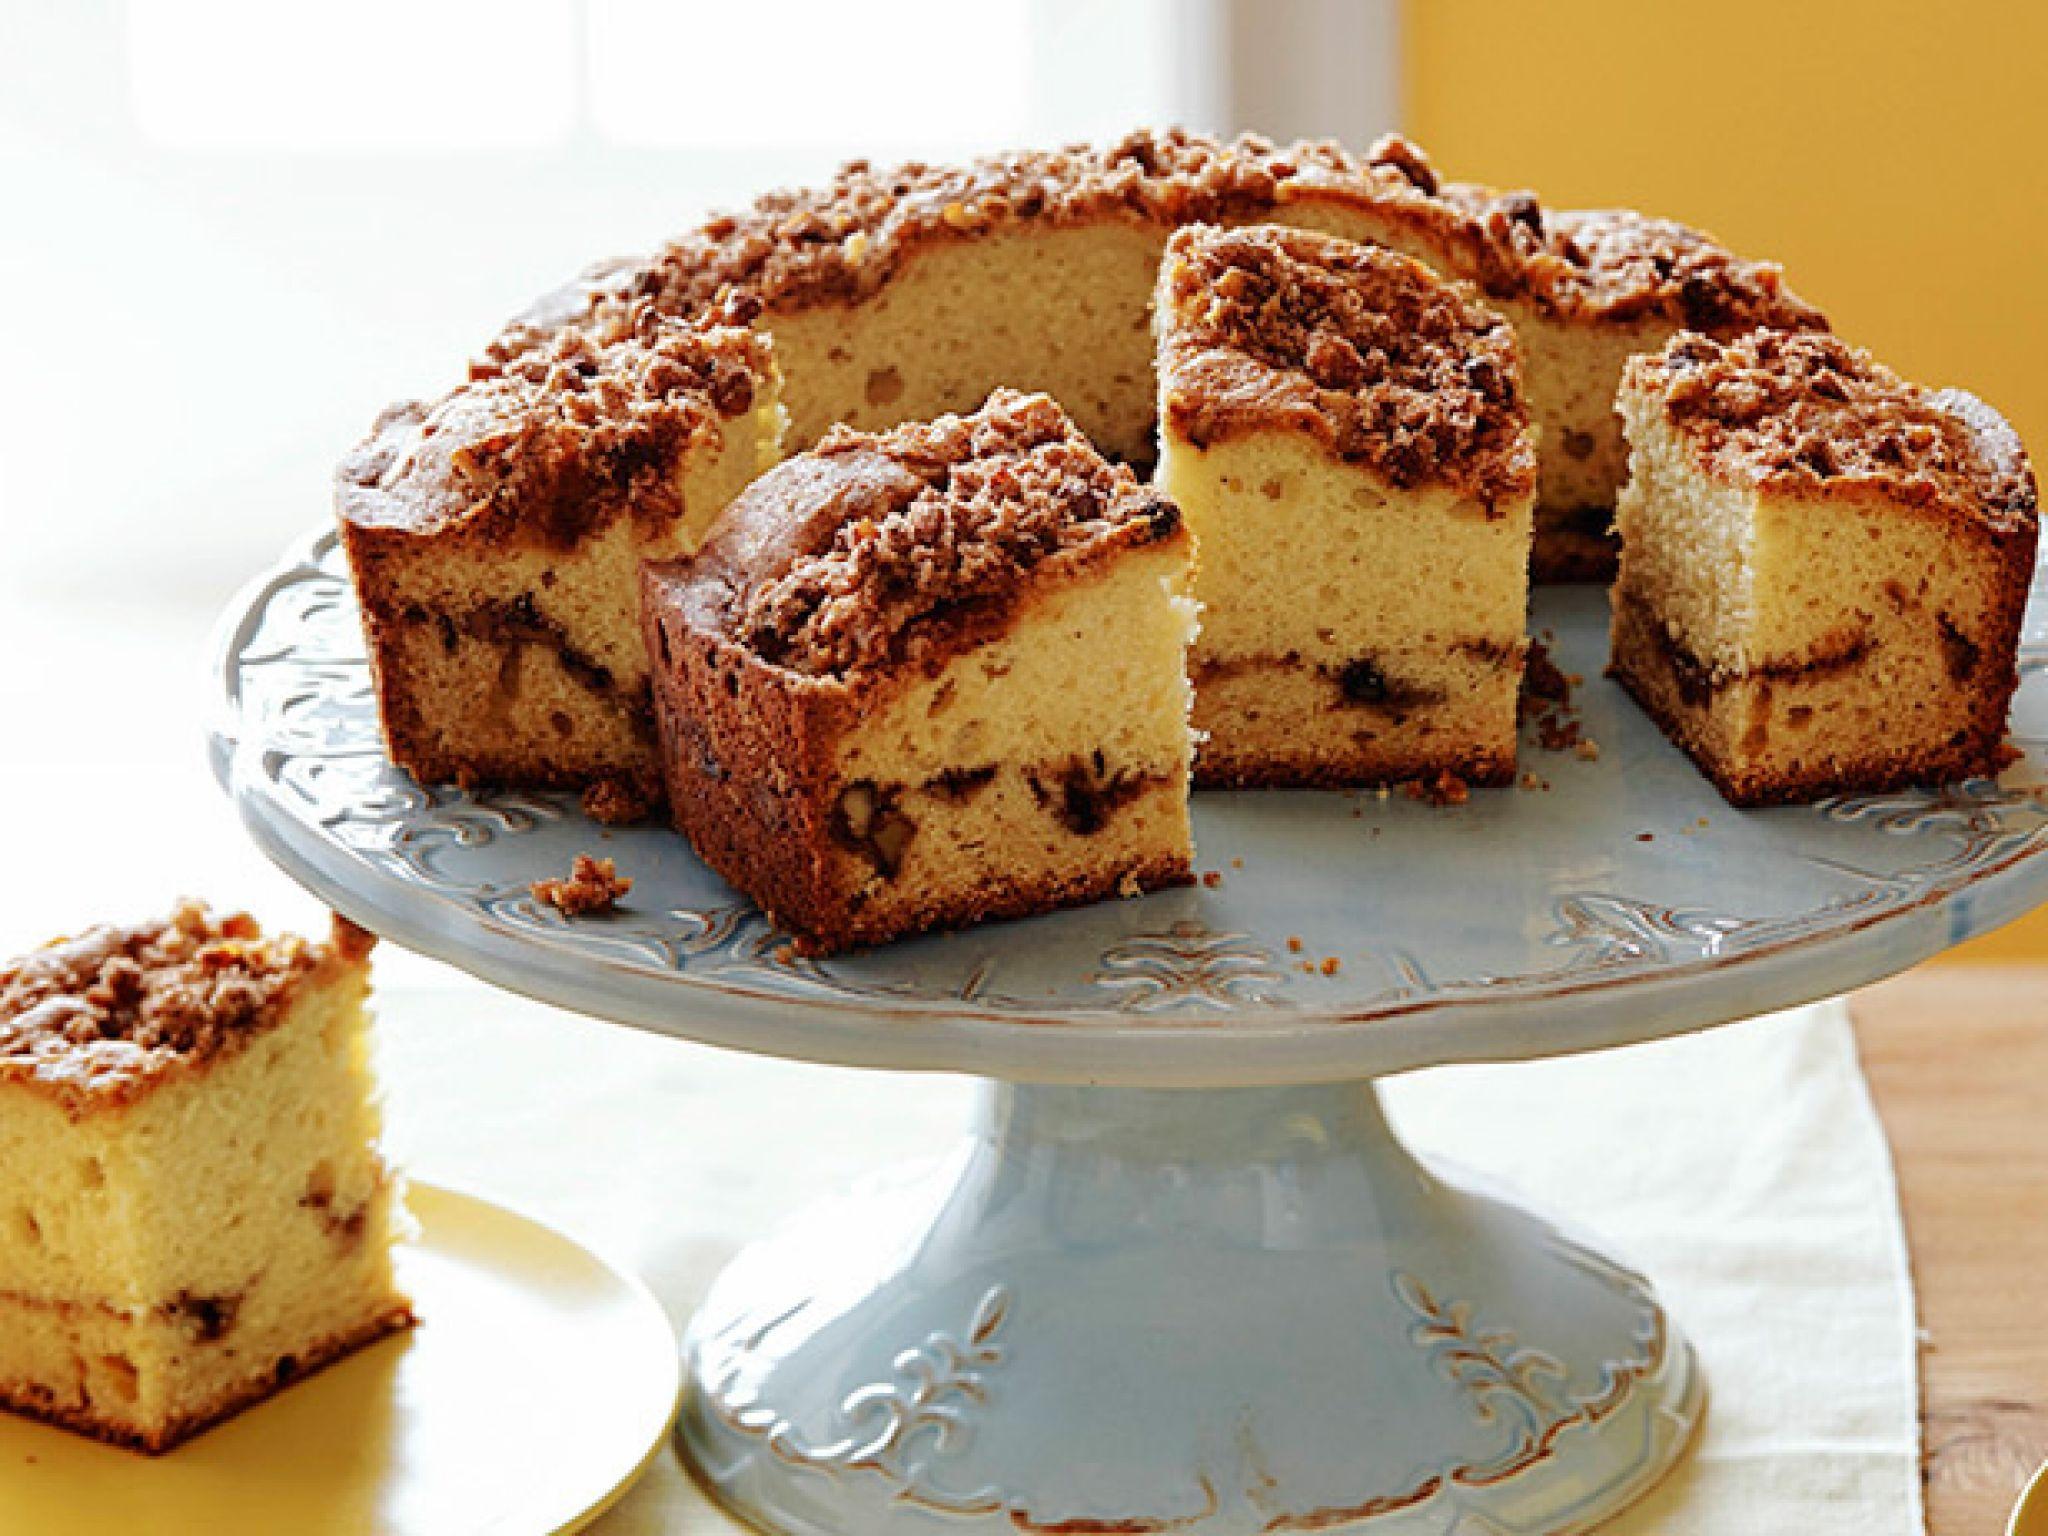 Sour Cream Coffee Cake Recipe Sour Cream Coffee Cake Food Network Recipes Coffee Cake Recipes